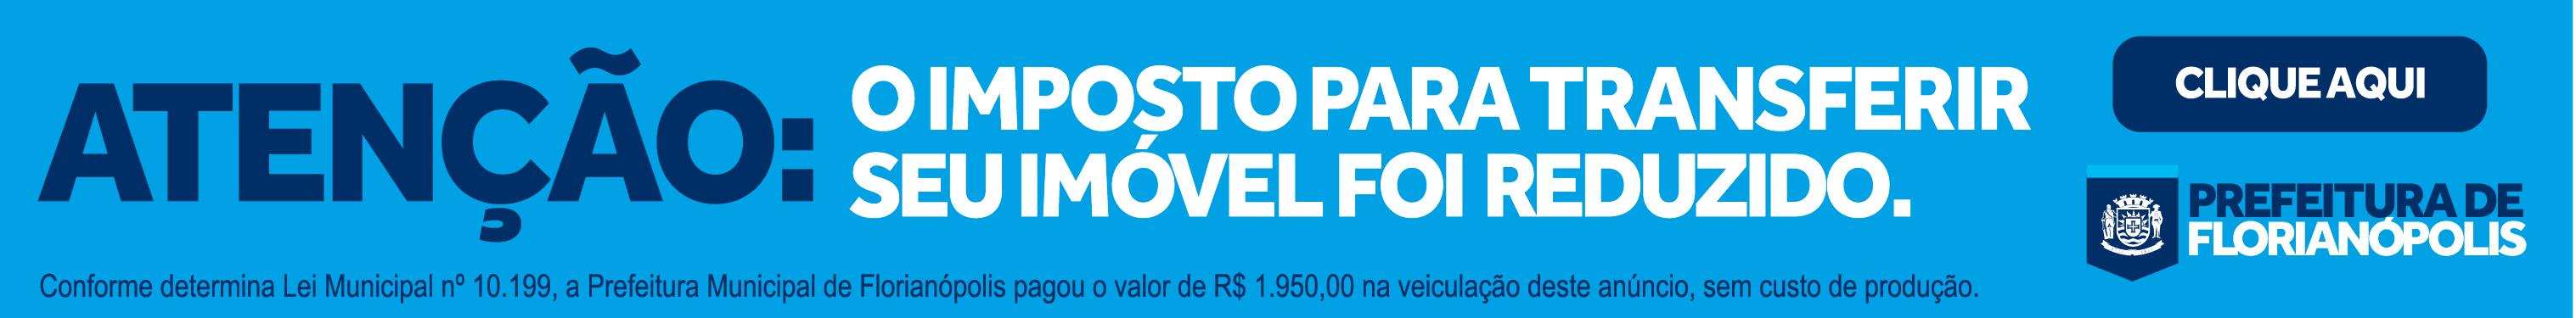 banner-novo-reducao-itbi